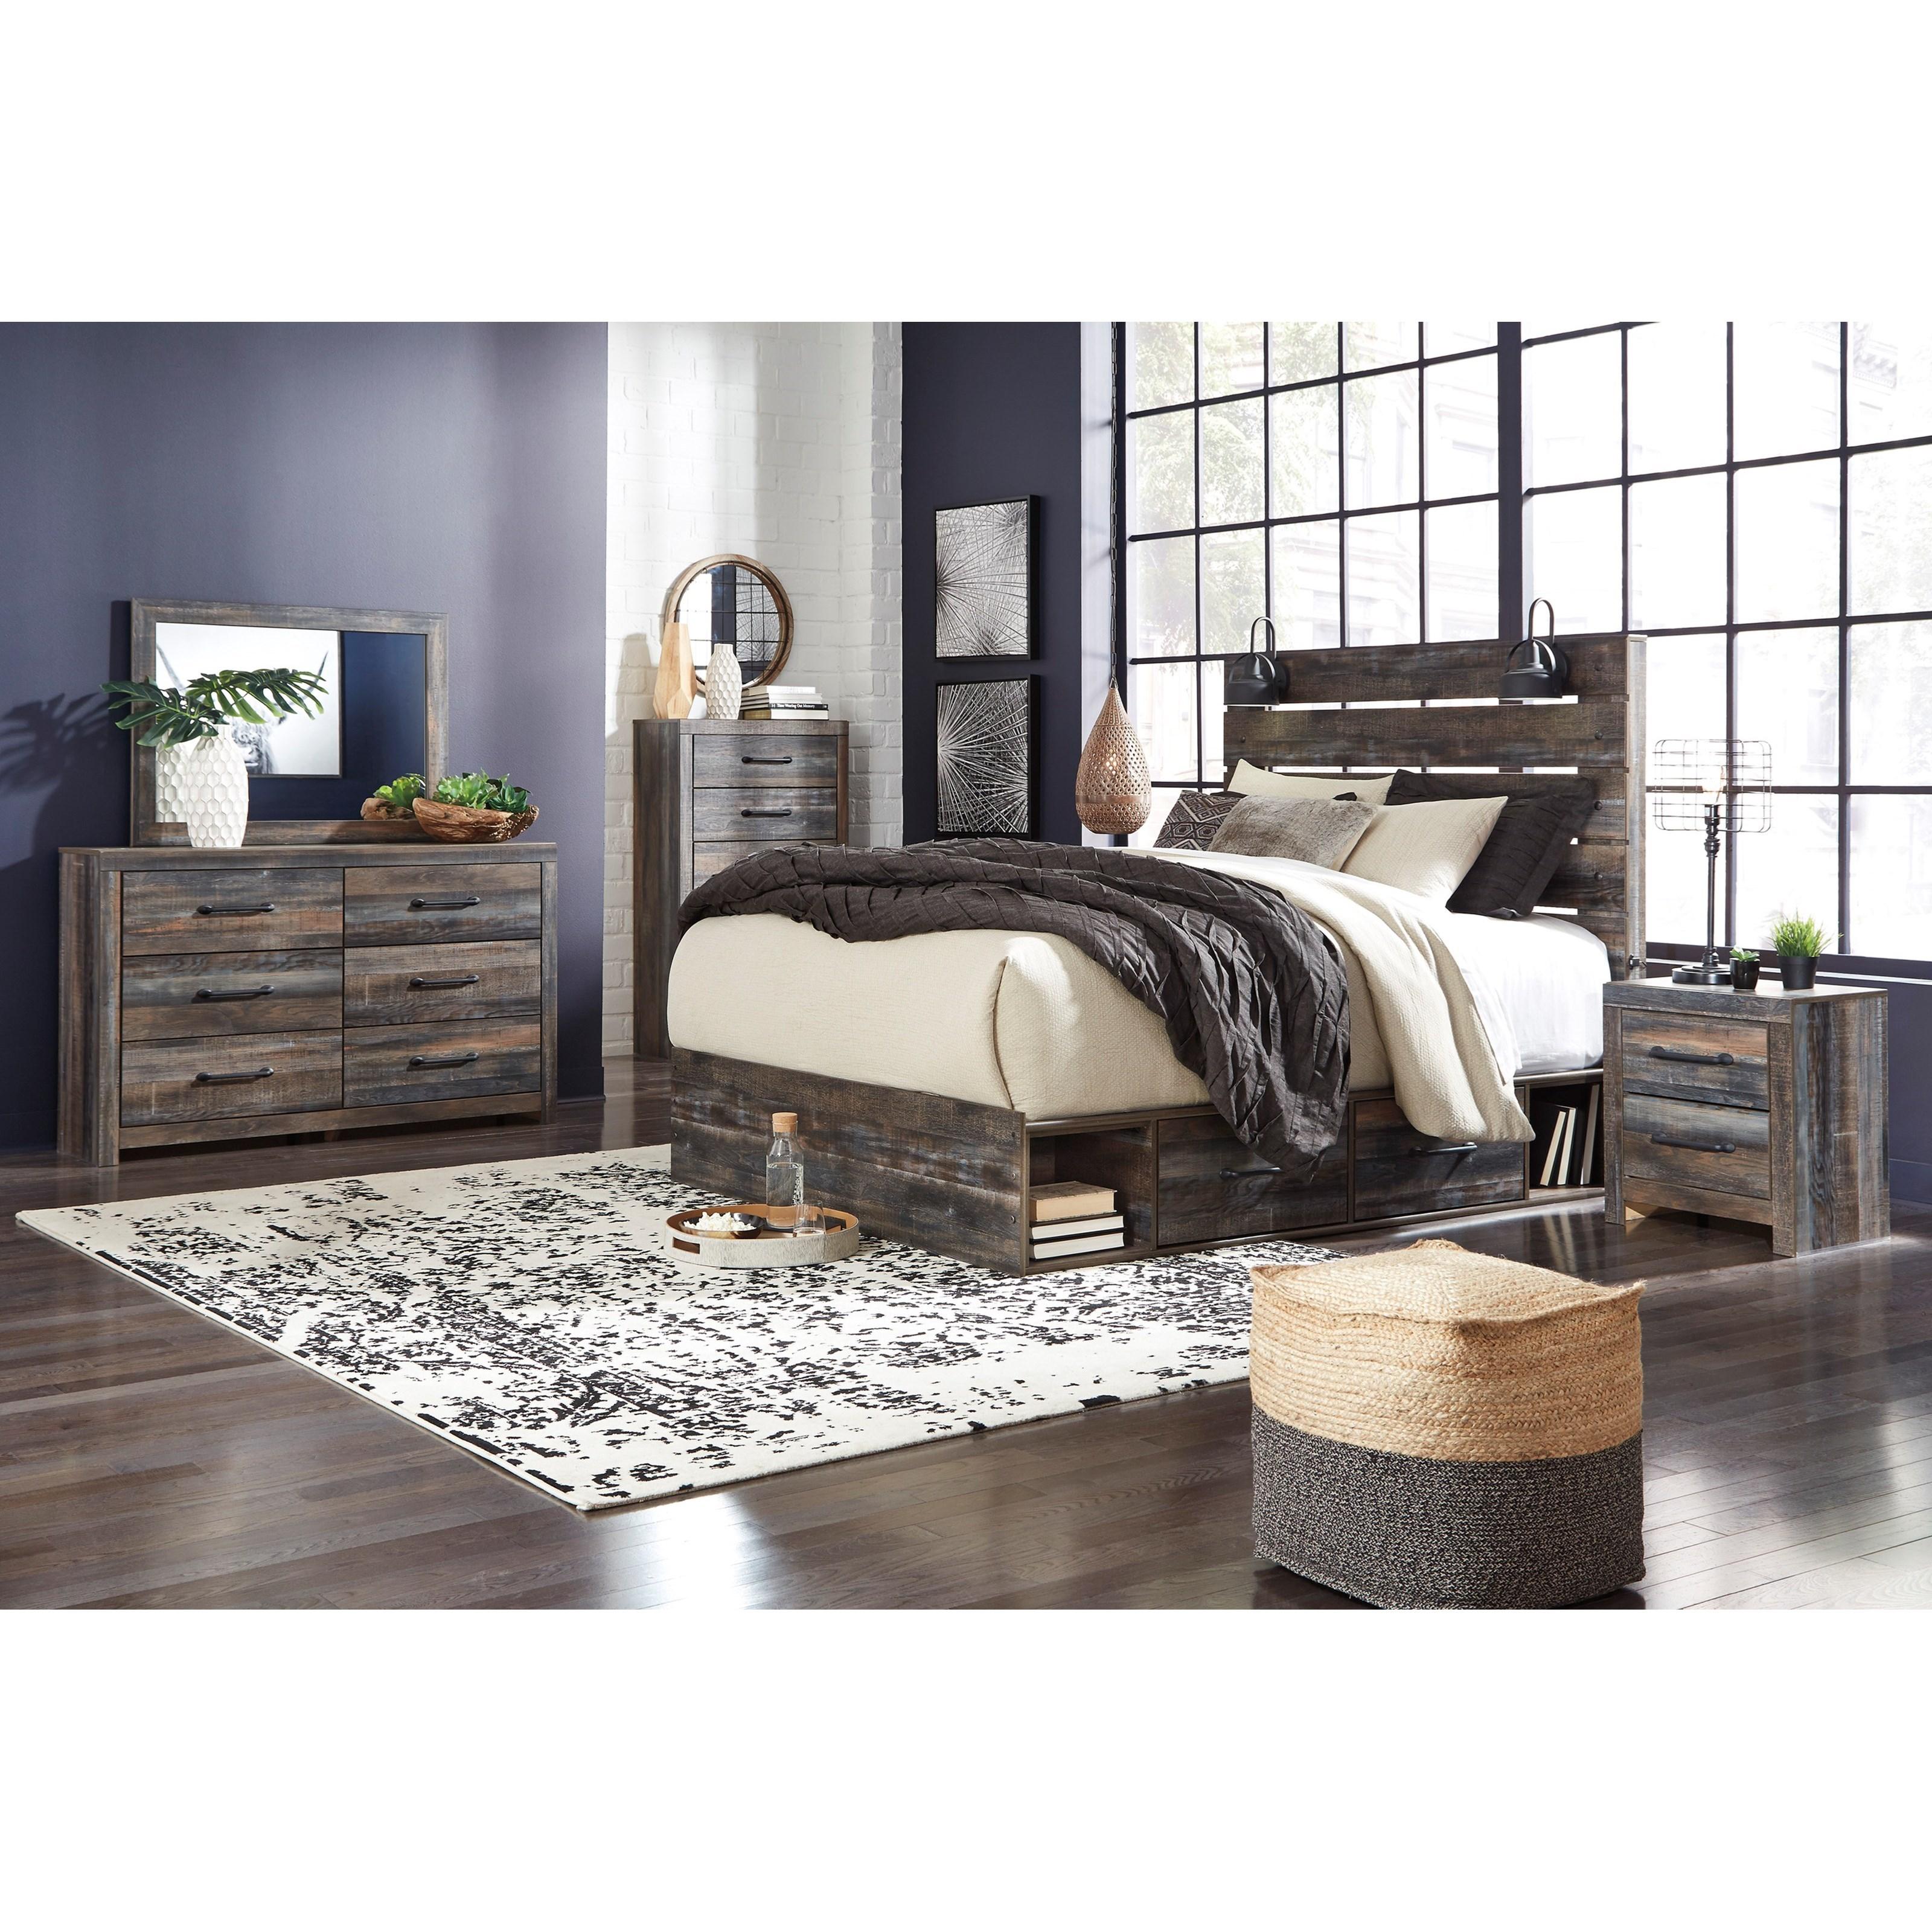 Ashley Furniture Manufacturer: Signature Design By Ashley Drystan Rustic 6-Drawer Dresser